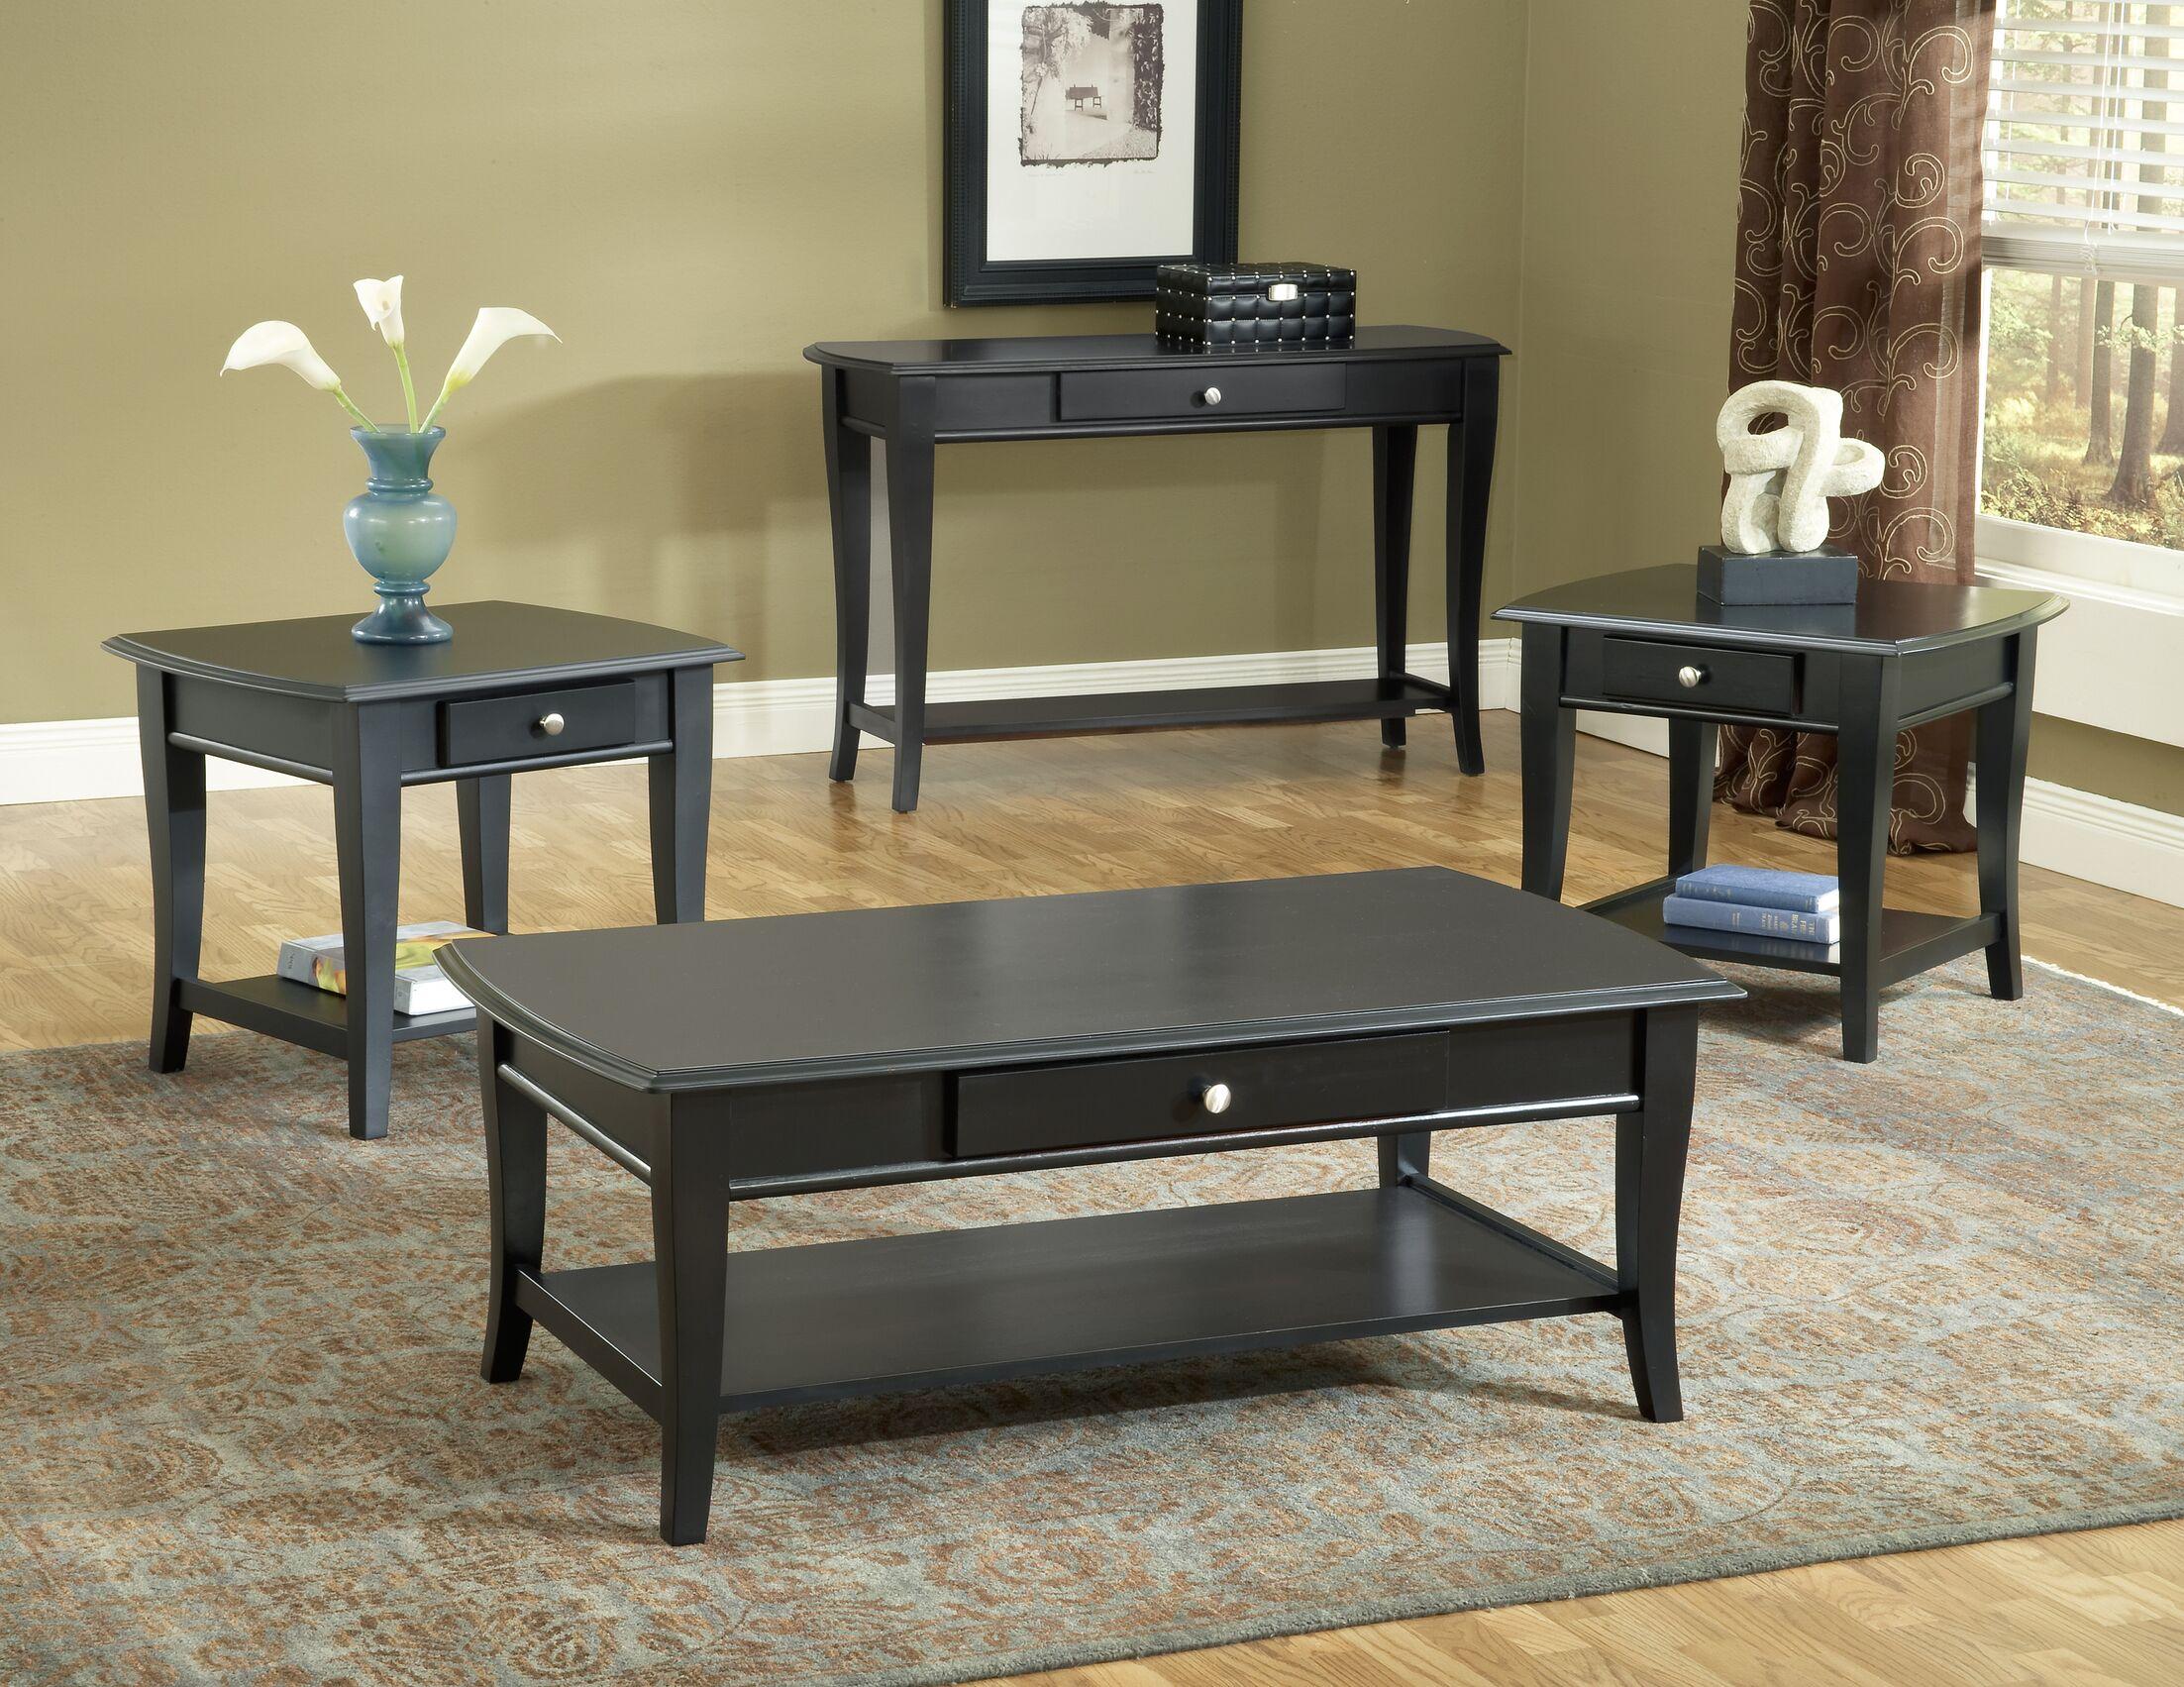 Hefley 3 Piece Coffee Table Set